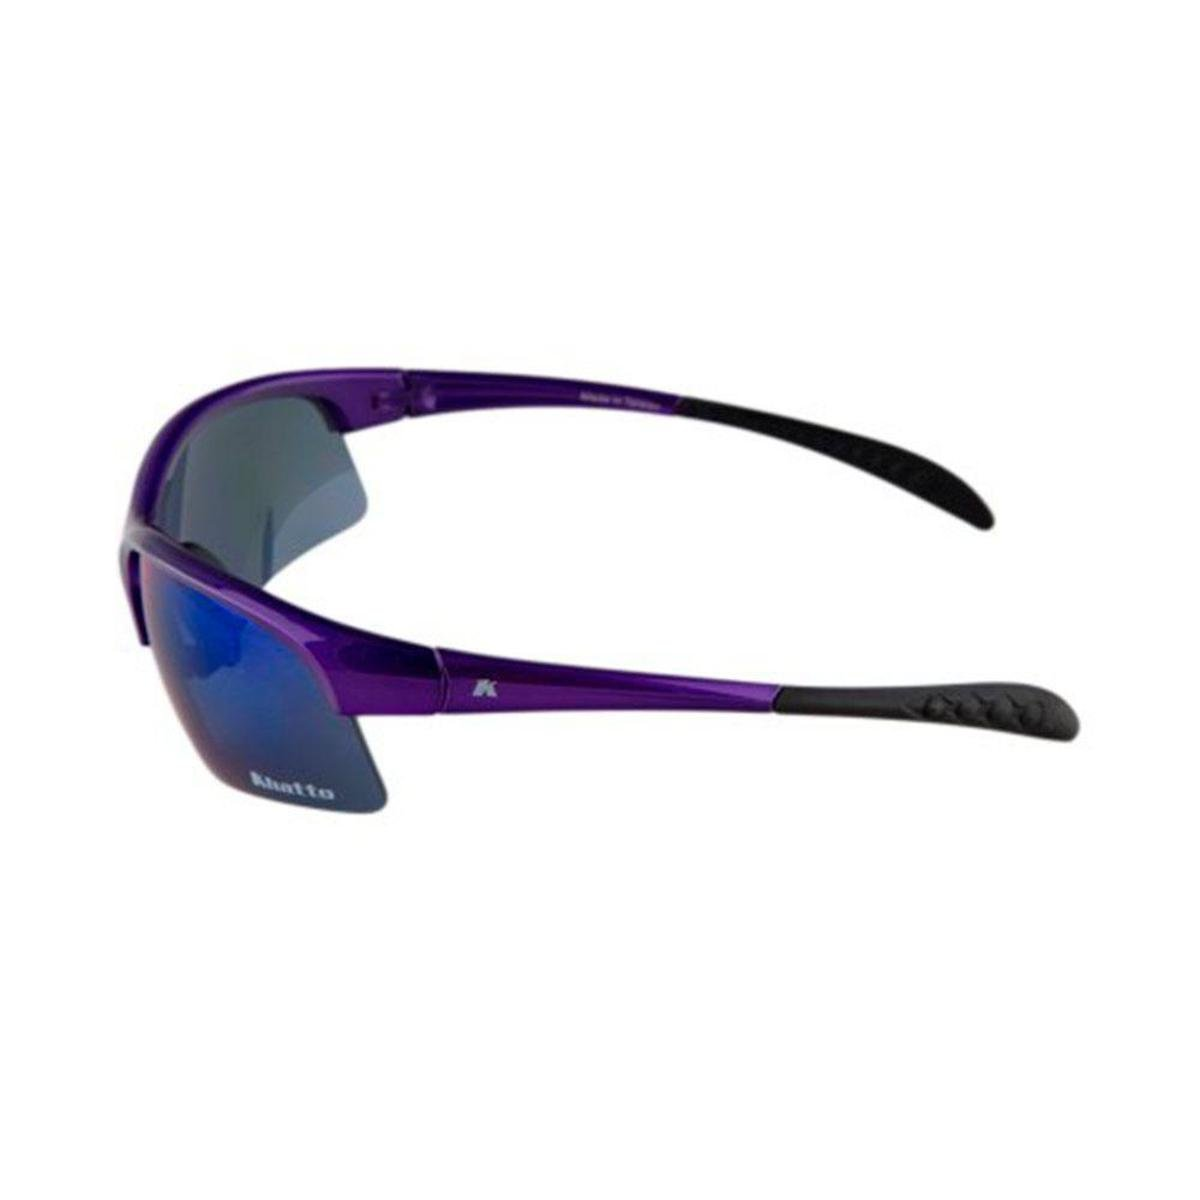 acb66f0967268 Óculos de Sol Khatto Esportivo Fashion Masculino - Compre Agora ...